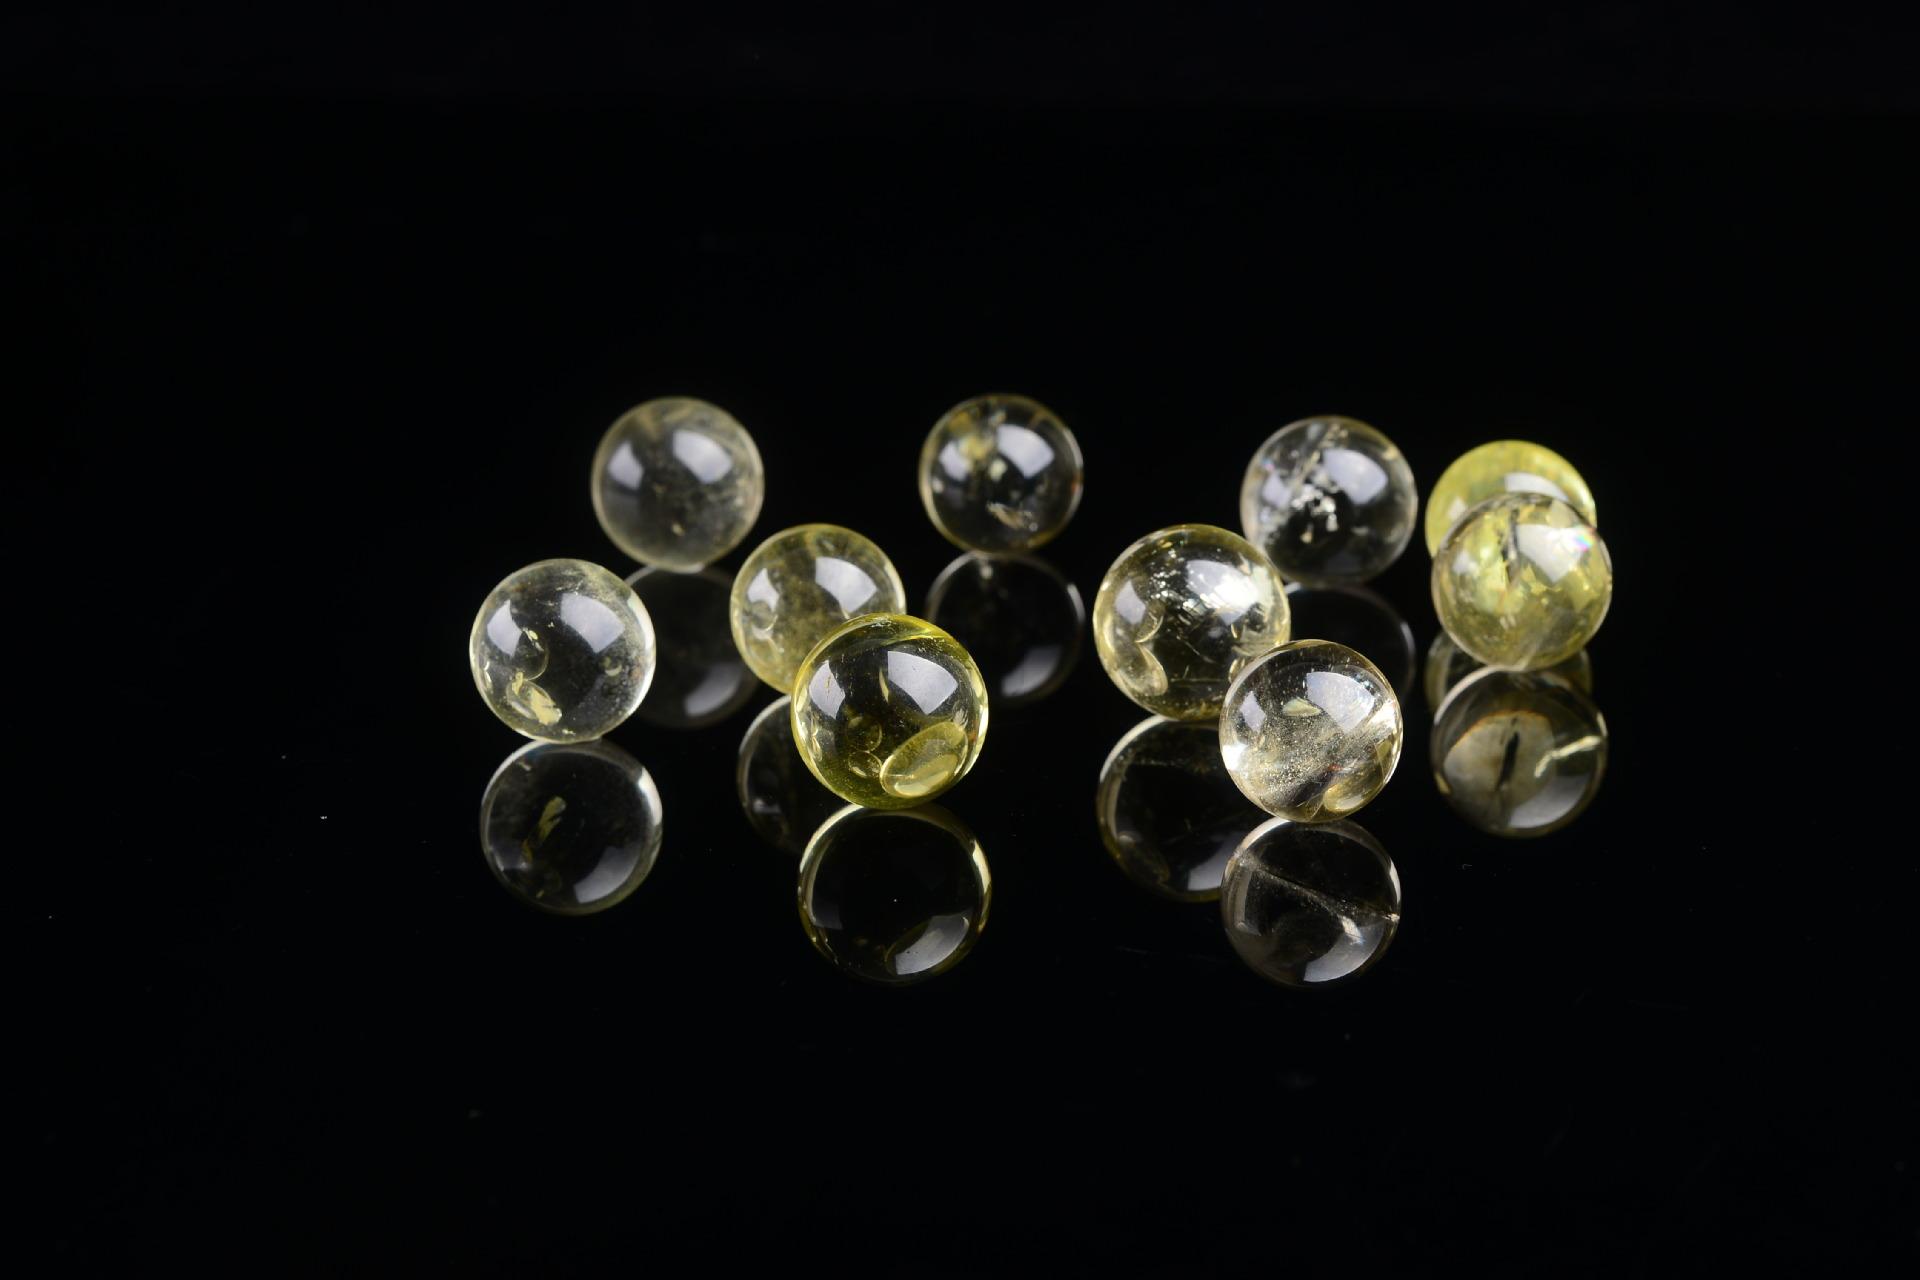 Seven Array Star Obsidian Crystal Ball Furniture Display Decor Multicolor